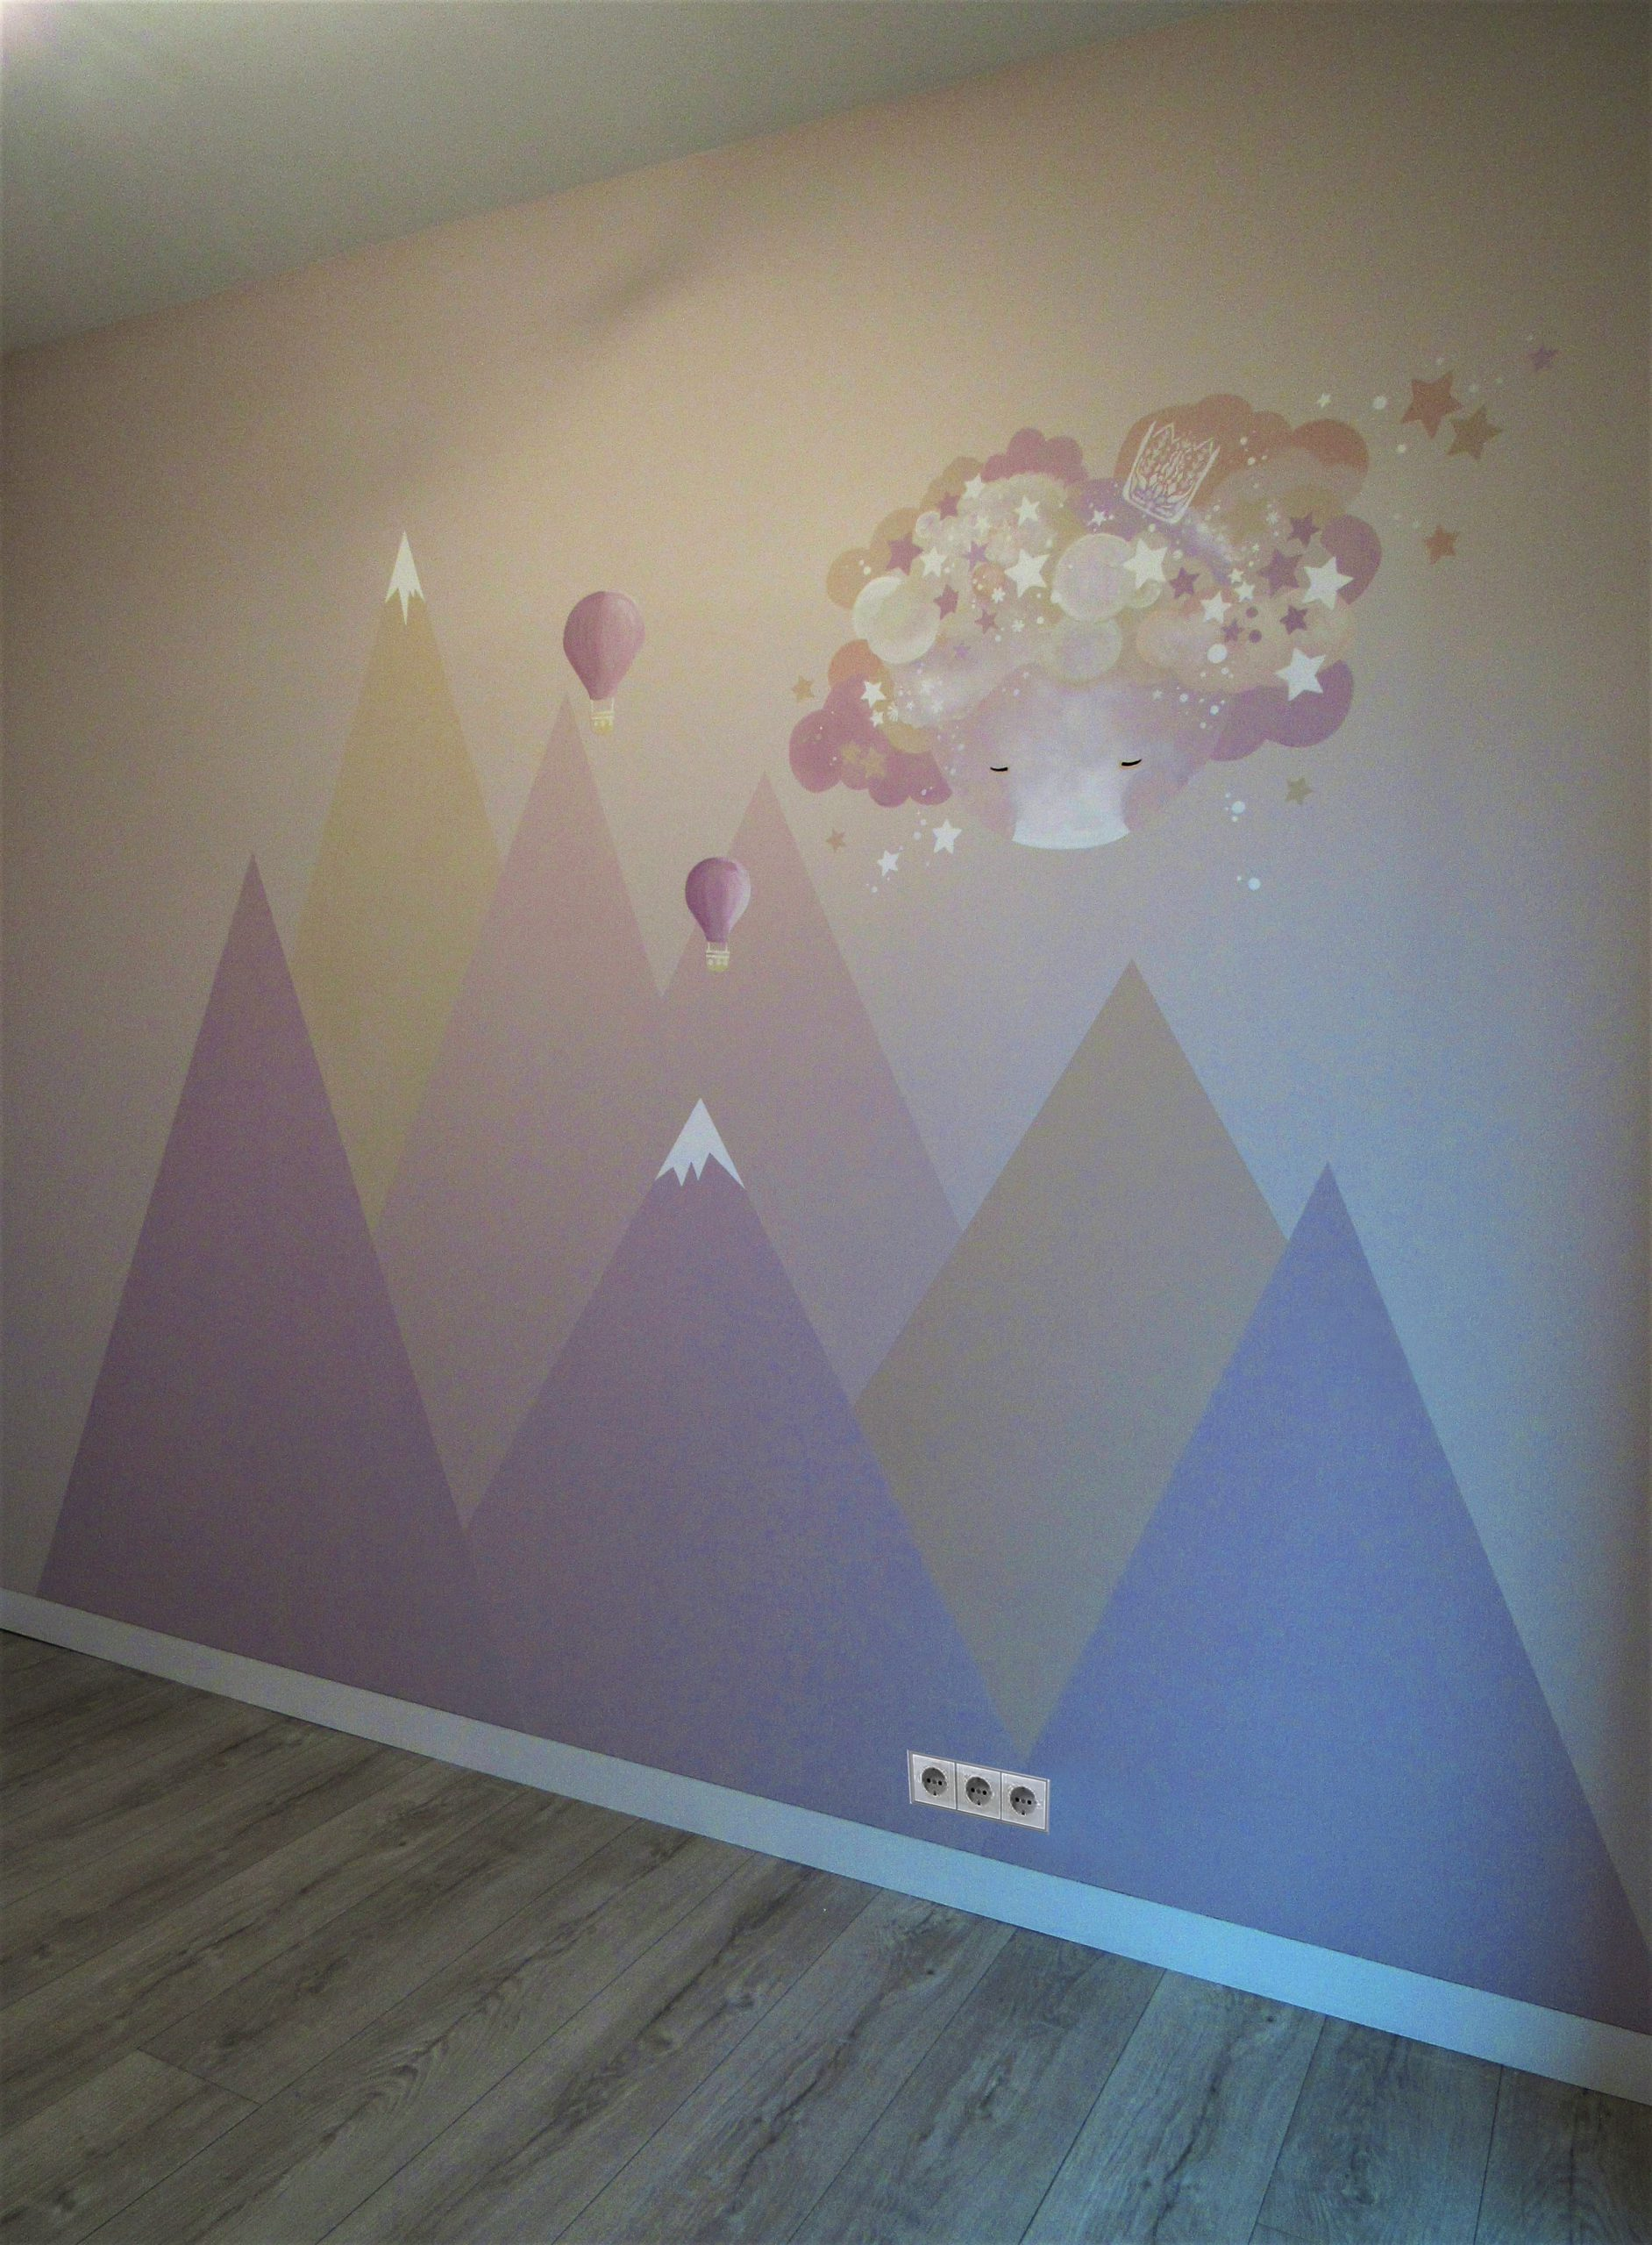 menine-kuryba-sienu-dekoravimas (17)